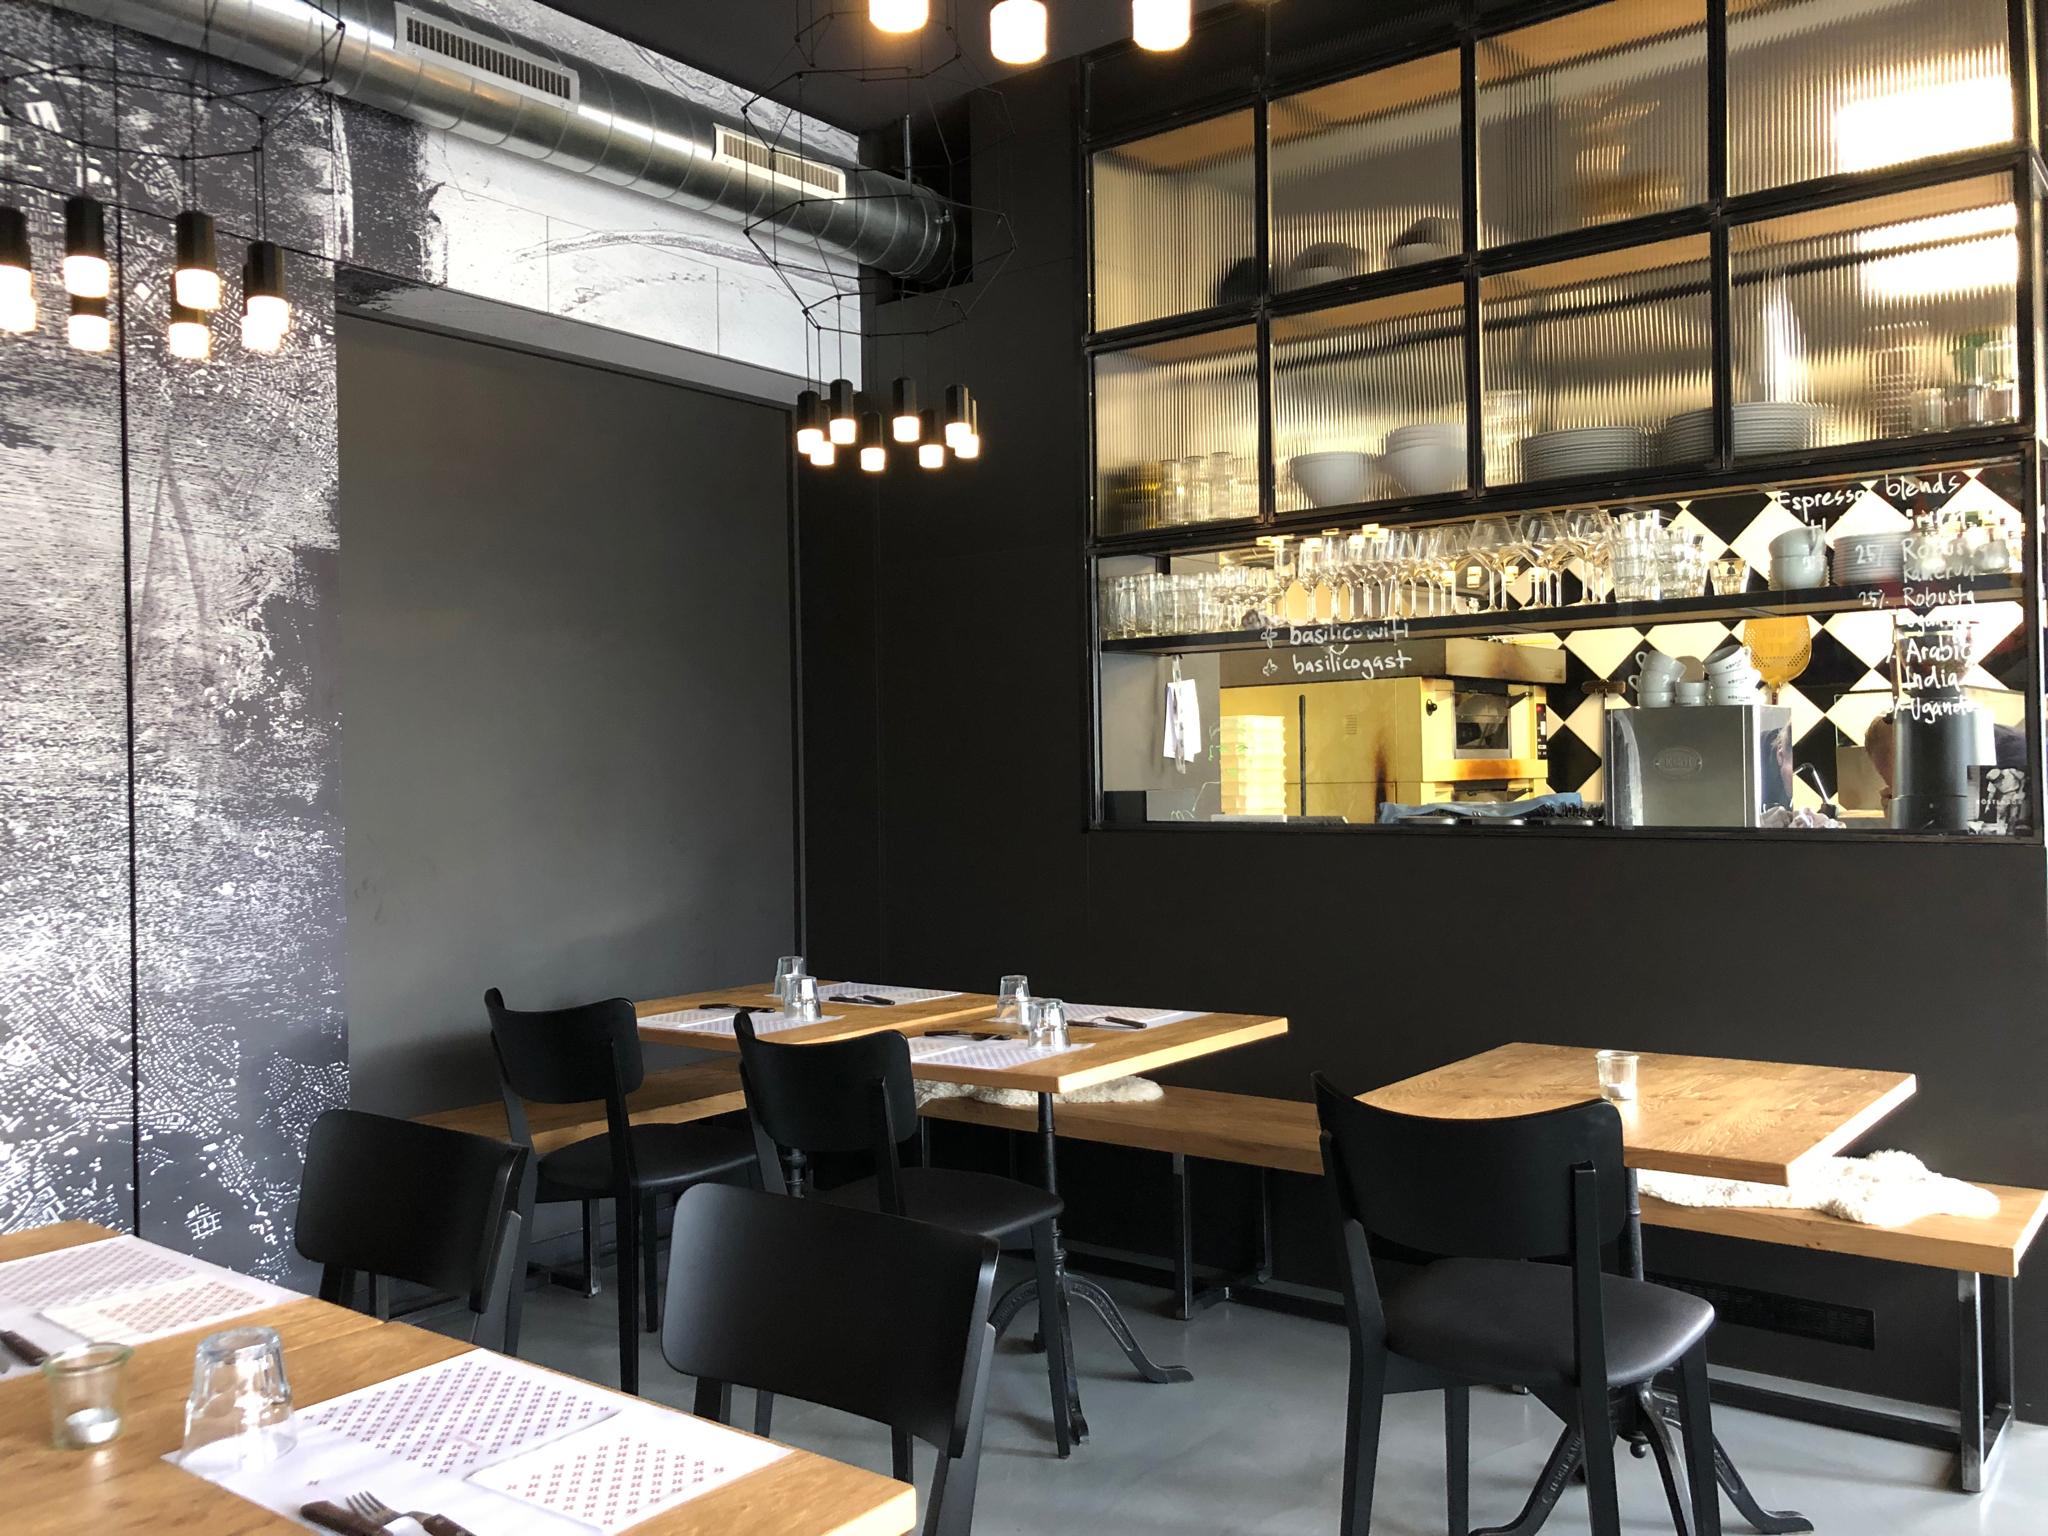 Restaurant_Design_Innen & Architektur_Studer.jpg